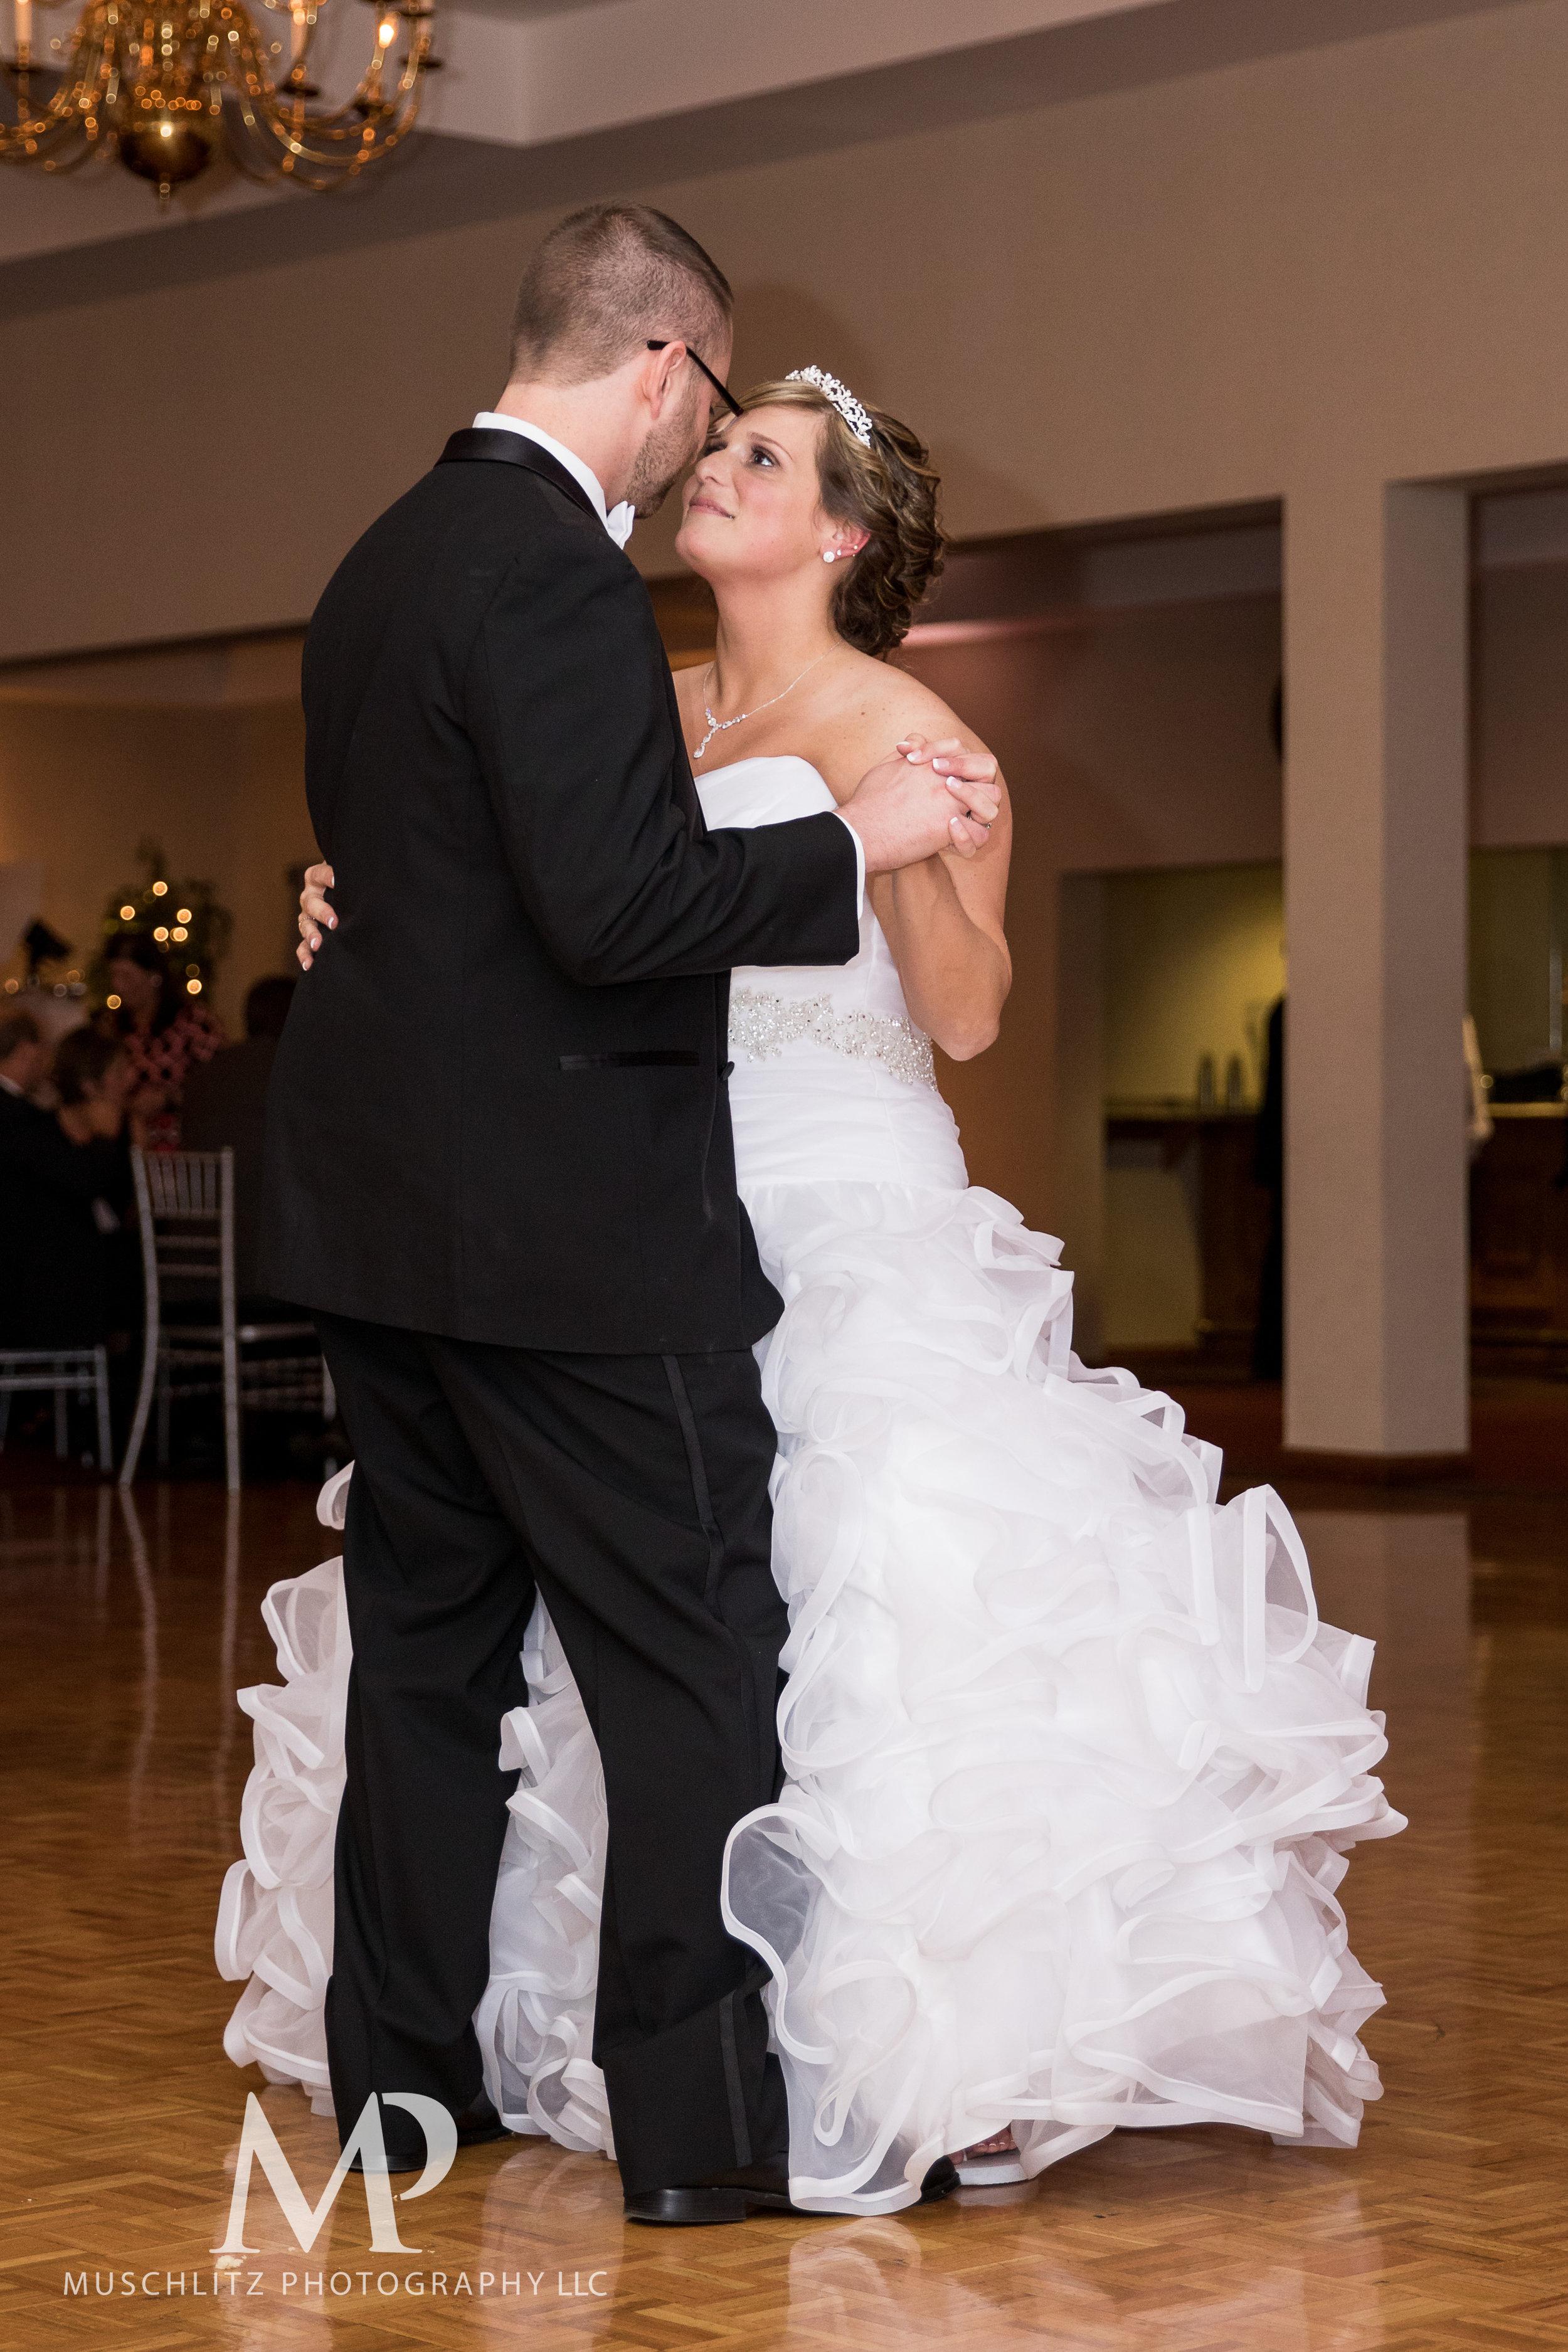 annunciation-banquet-conference-center-downtown-columbus-wedding-reception-downtown-columbus-ohio-muschlitz-photography-016.JPG